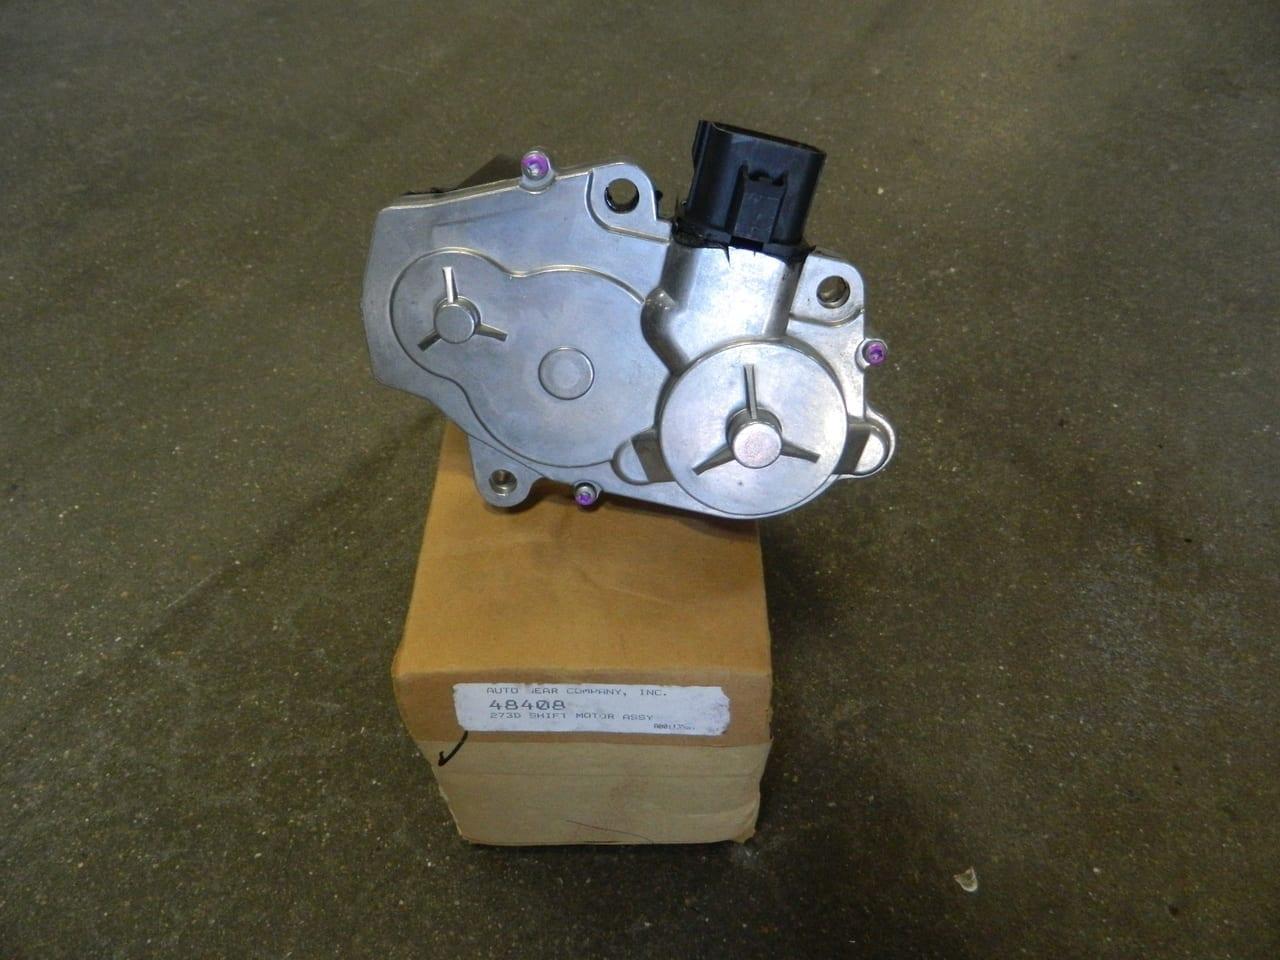 2005-2012 Dodge Ram 2500 3500 Transfer Case Shift Motor Encoder 273D New Venture